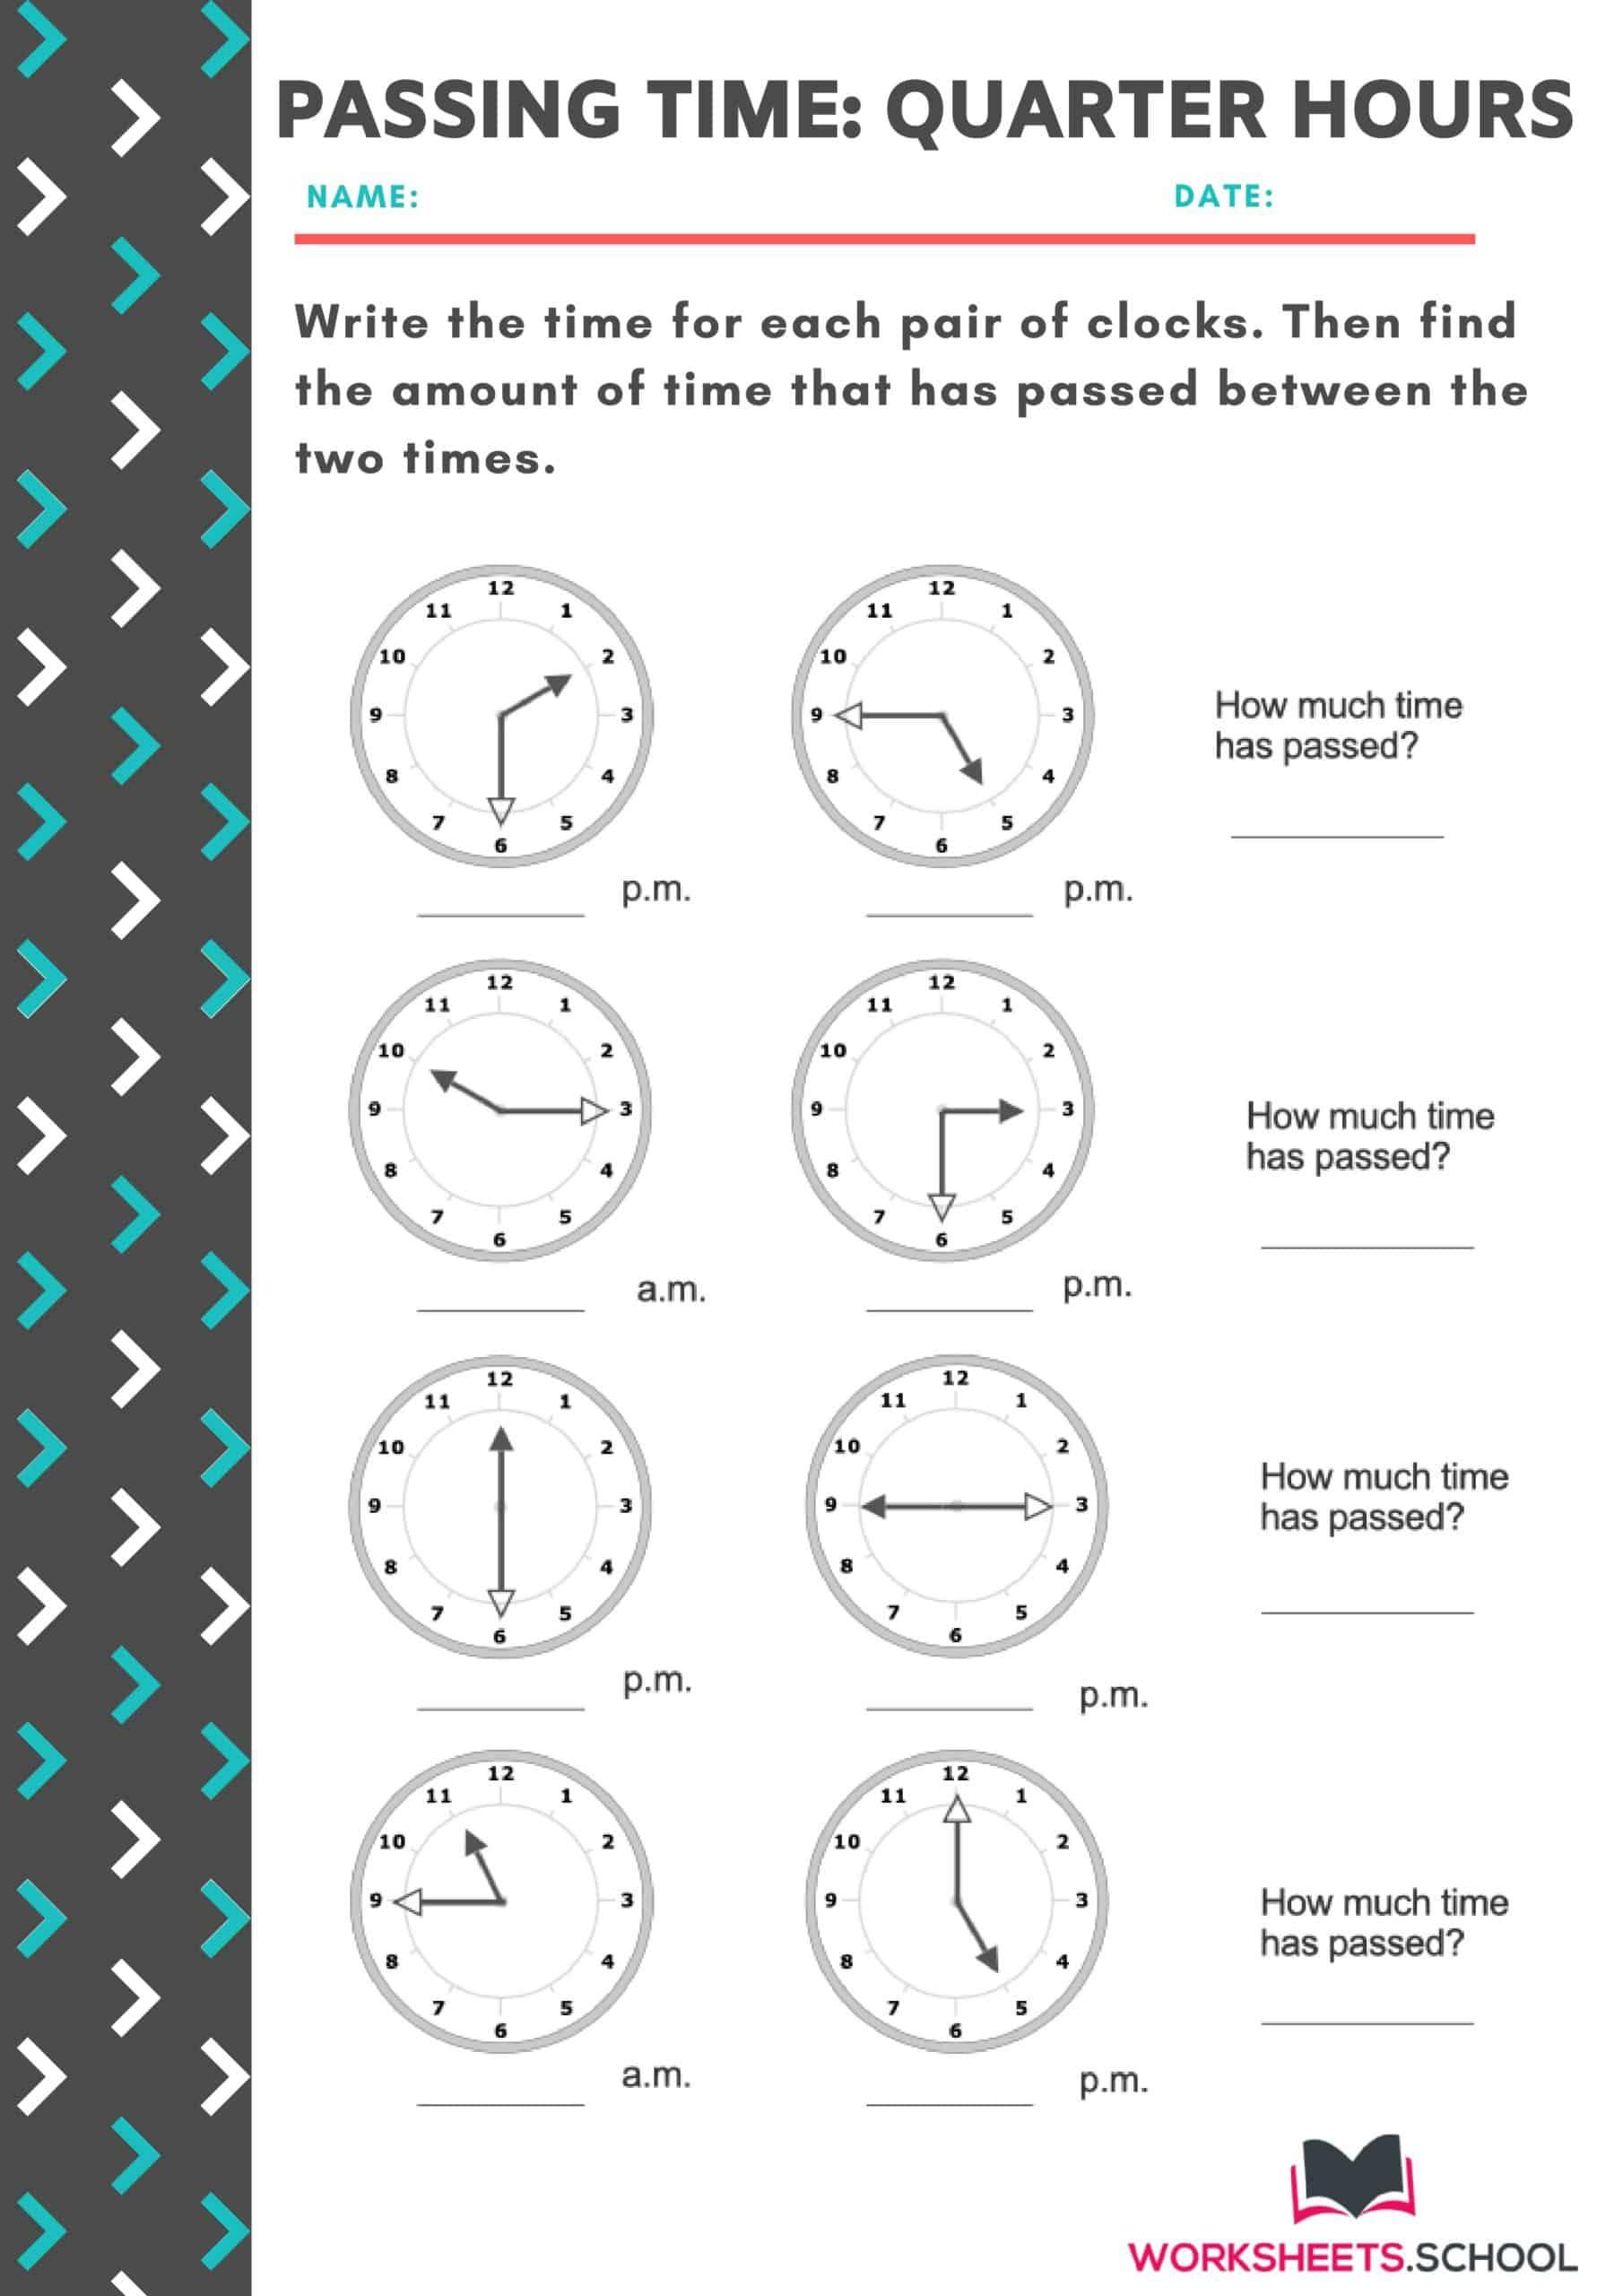 Passing Time Worksheet - Quarter Hours